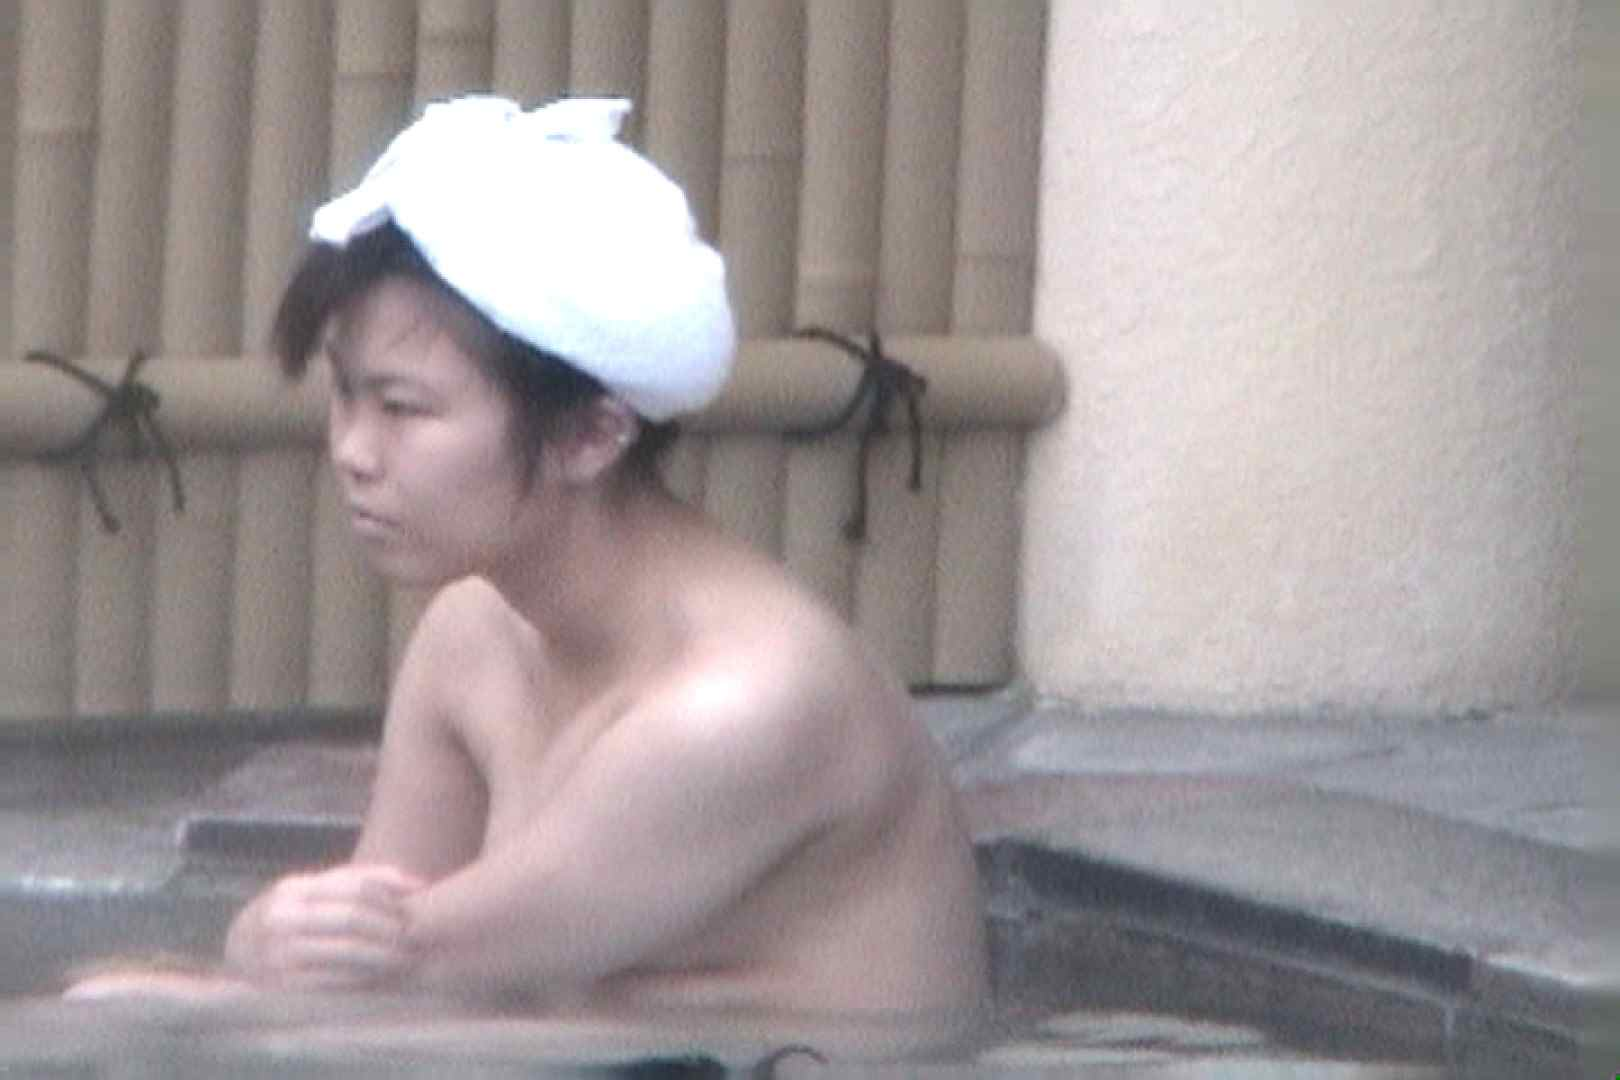 Aquaな露天風呂Vol.553 盗撮師作品 おまんこ無修正動画無料 93pic 59